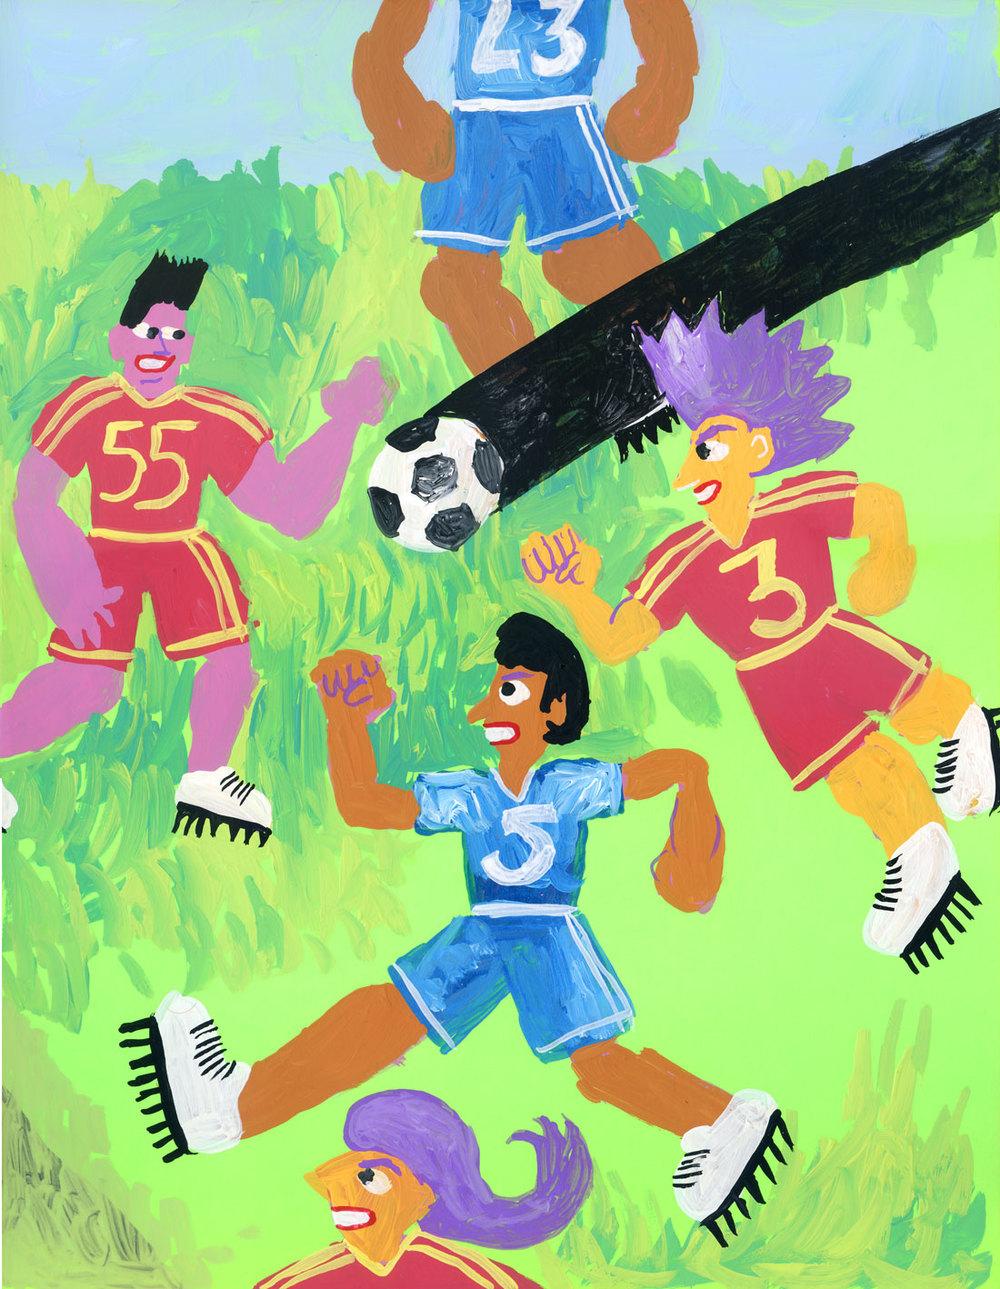 SoccerField_AnaBenaroya.jpg